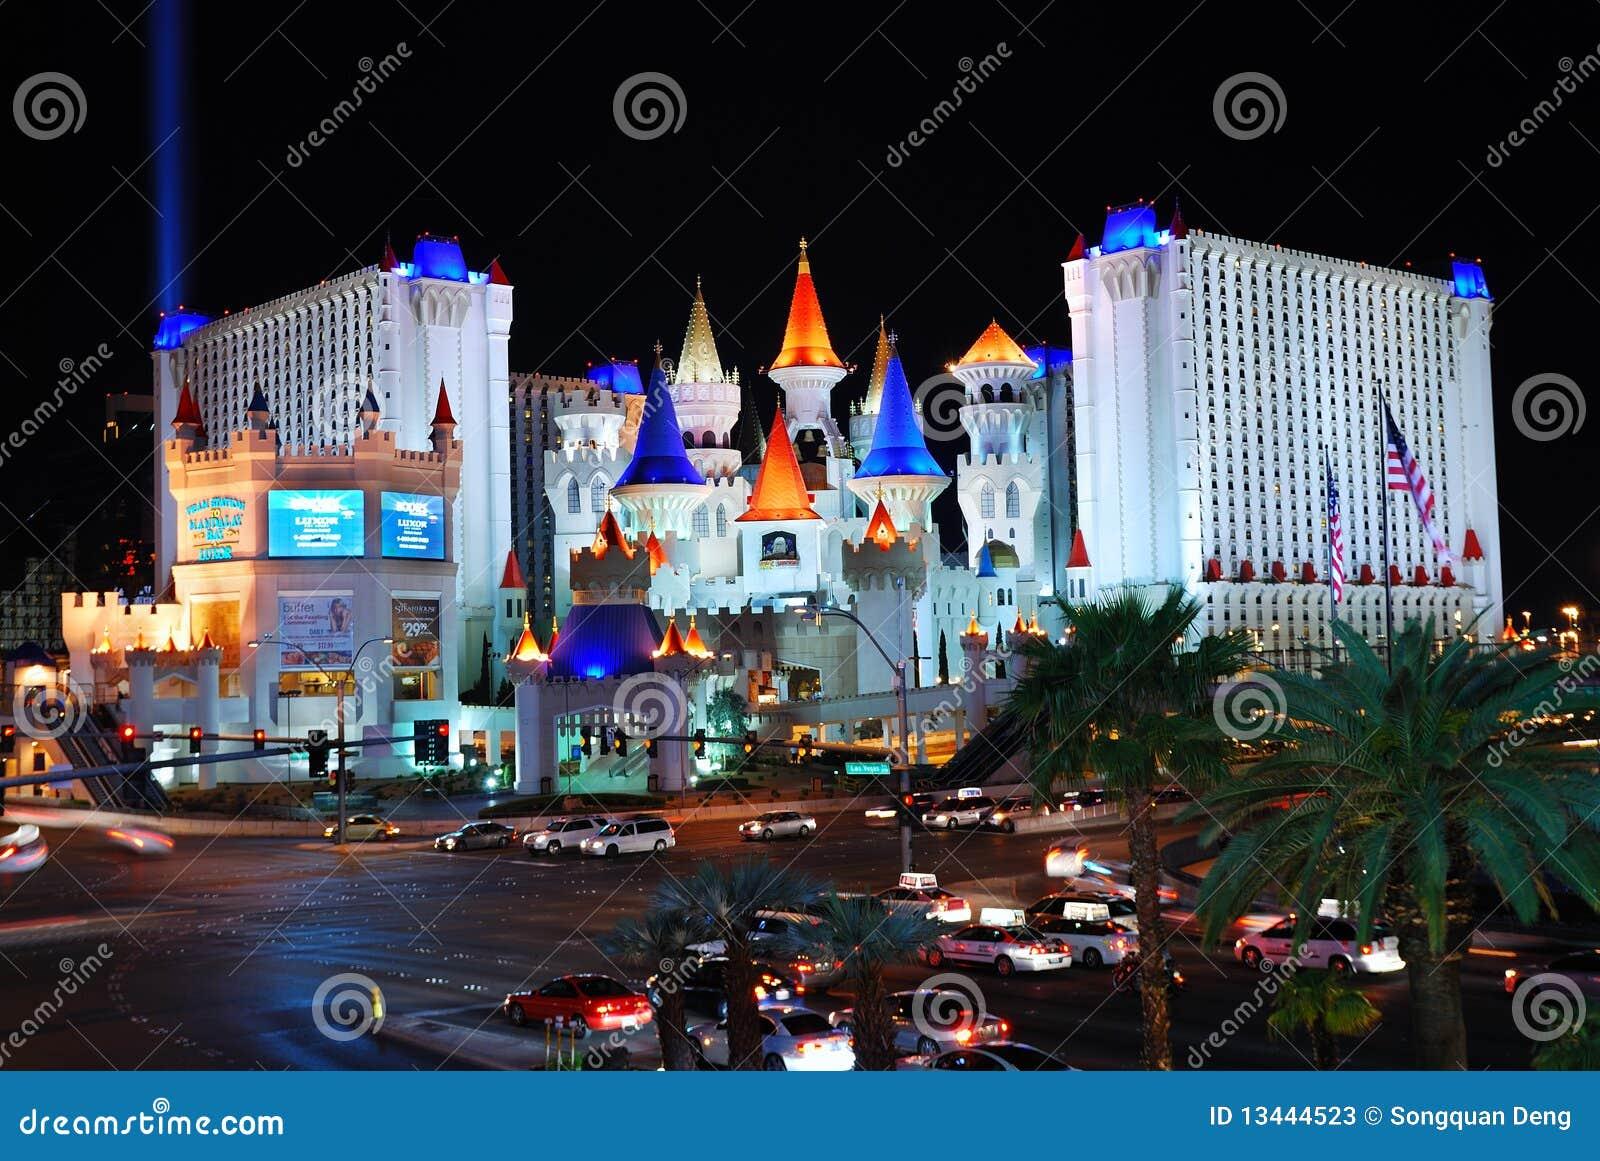 casinoes